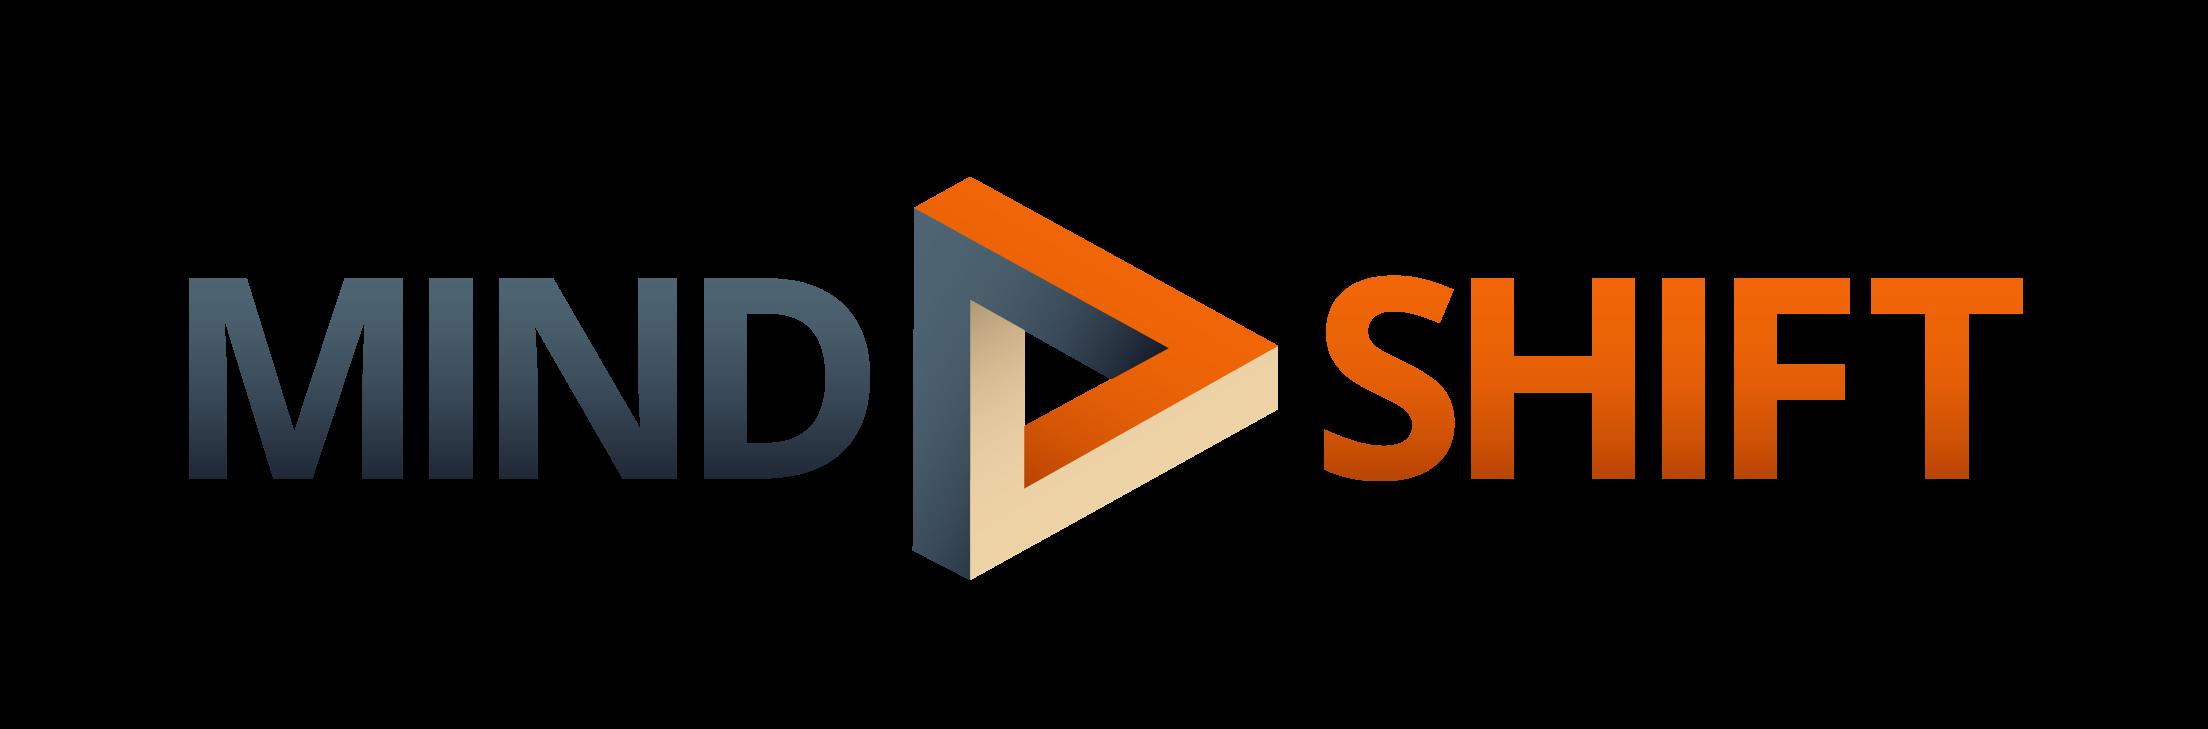 MindShift_Logo_Color_Stylized.png